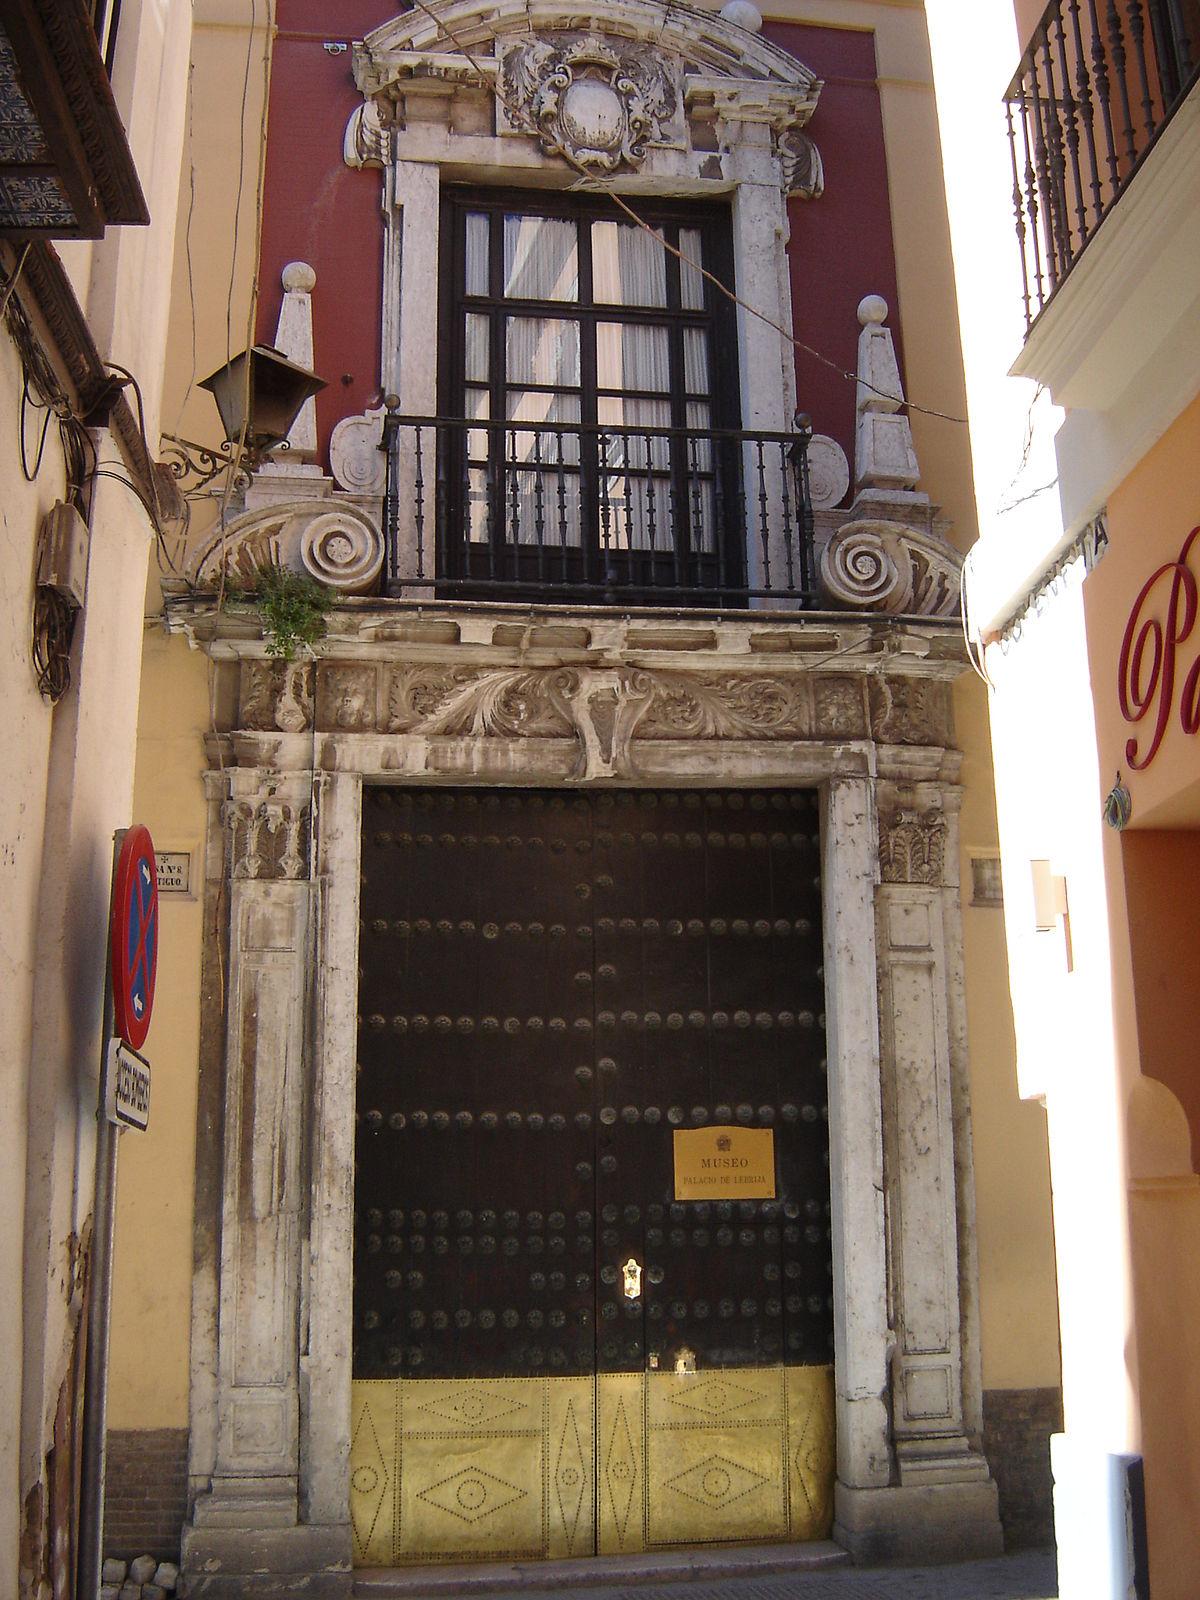 Palacio de la condesa de lebrija sevilla wikipedia la for Alquiler de casas en lebrija sevilla